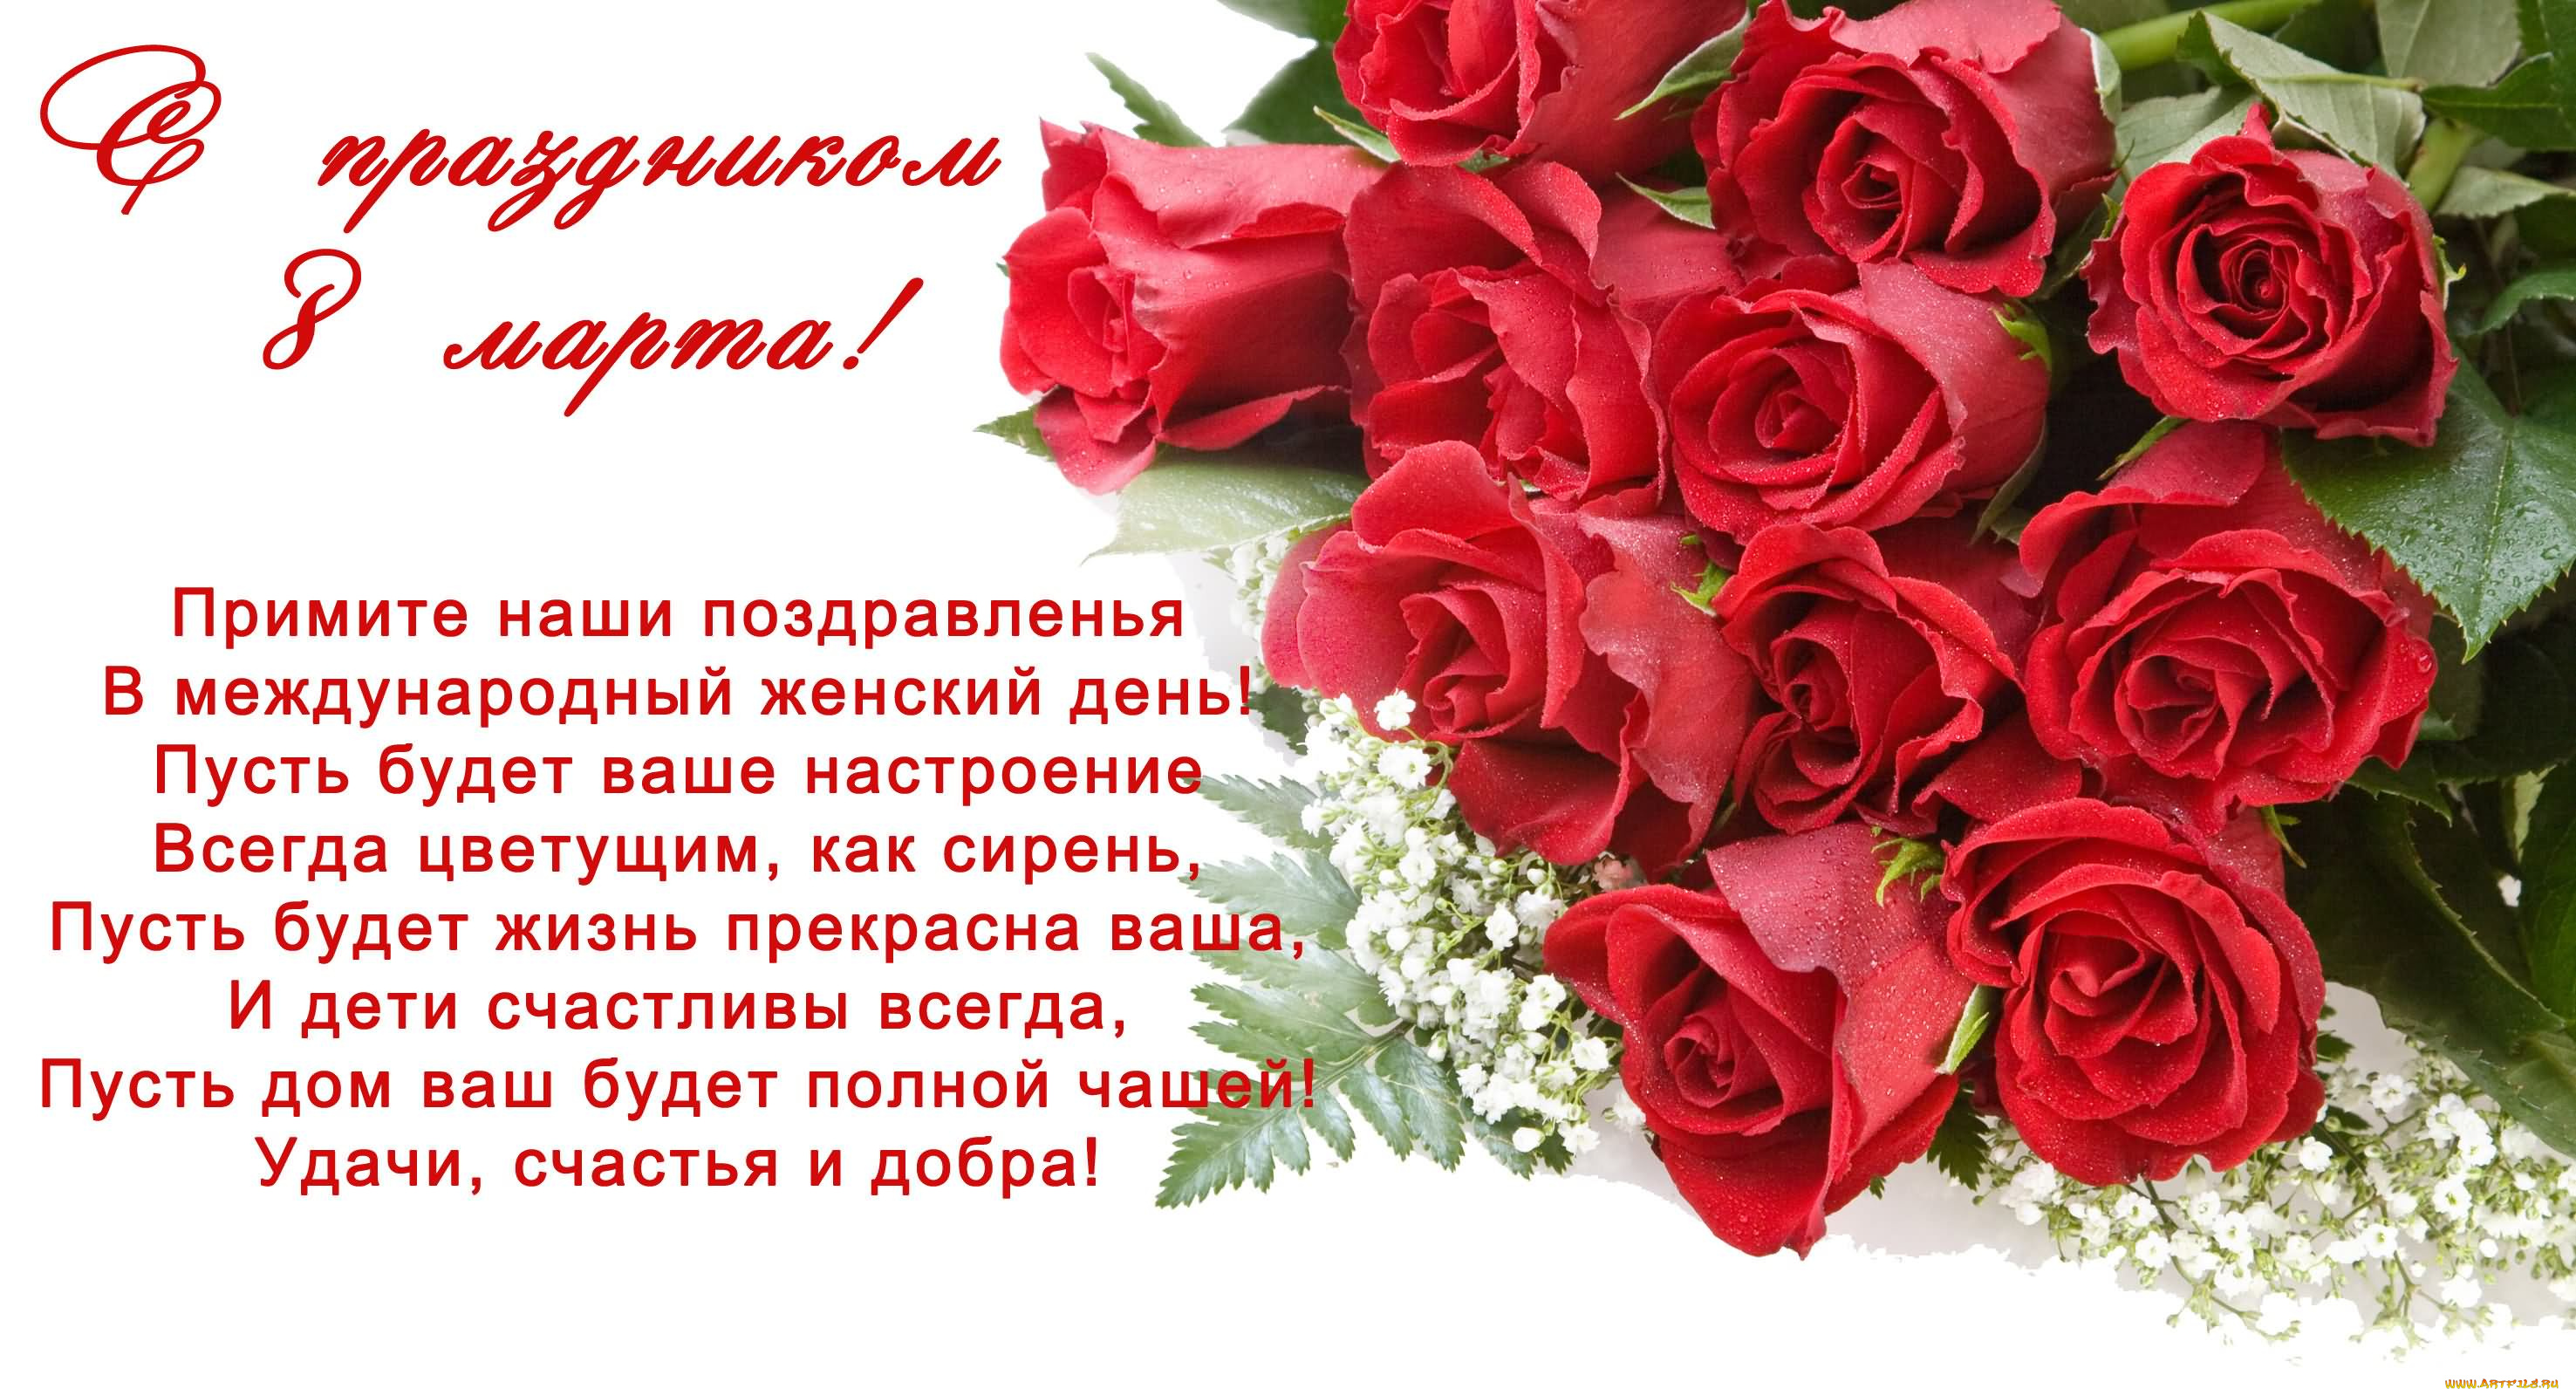 Пожелания на 8 марта с картинкой